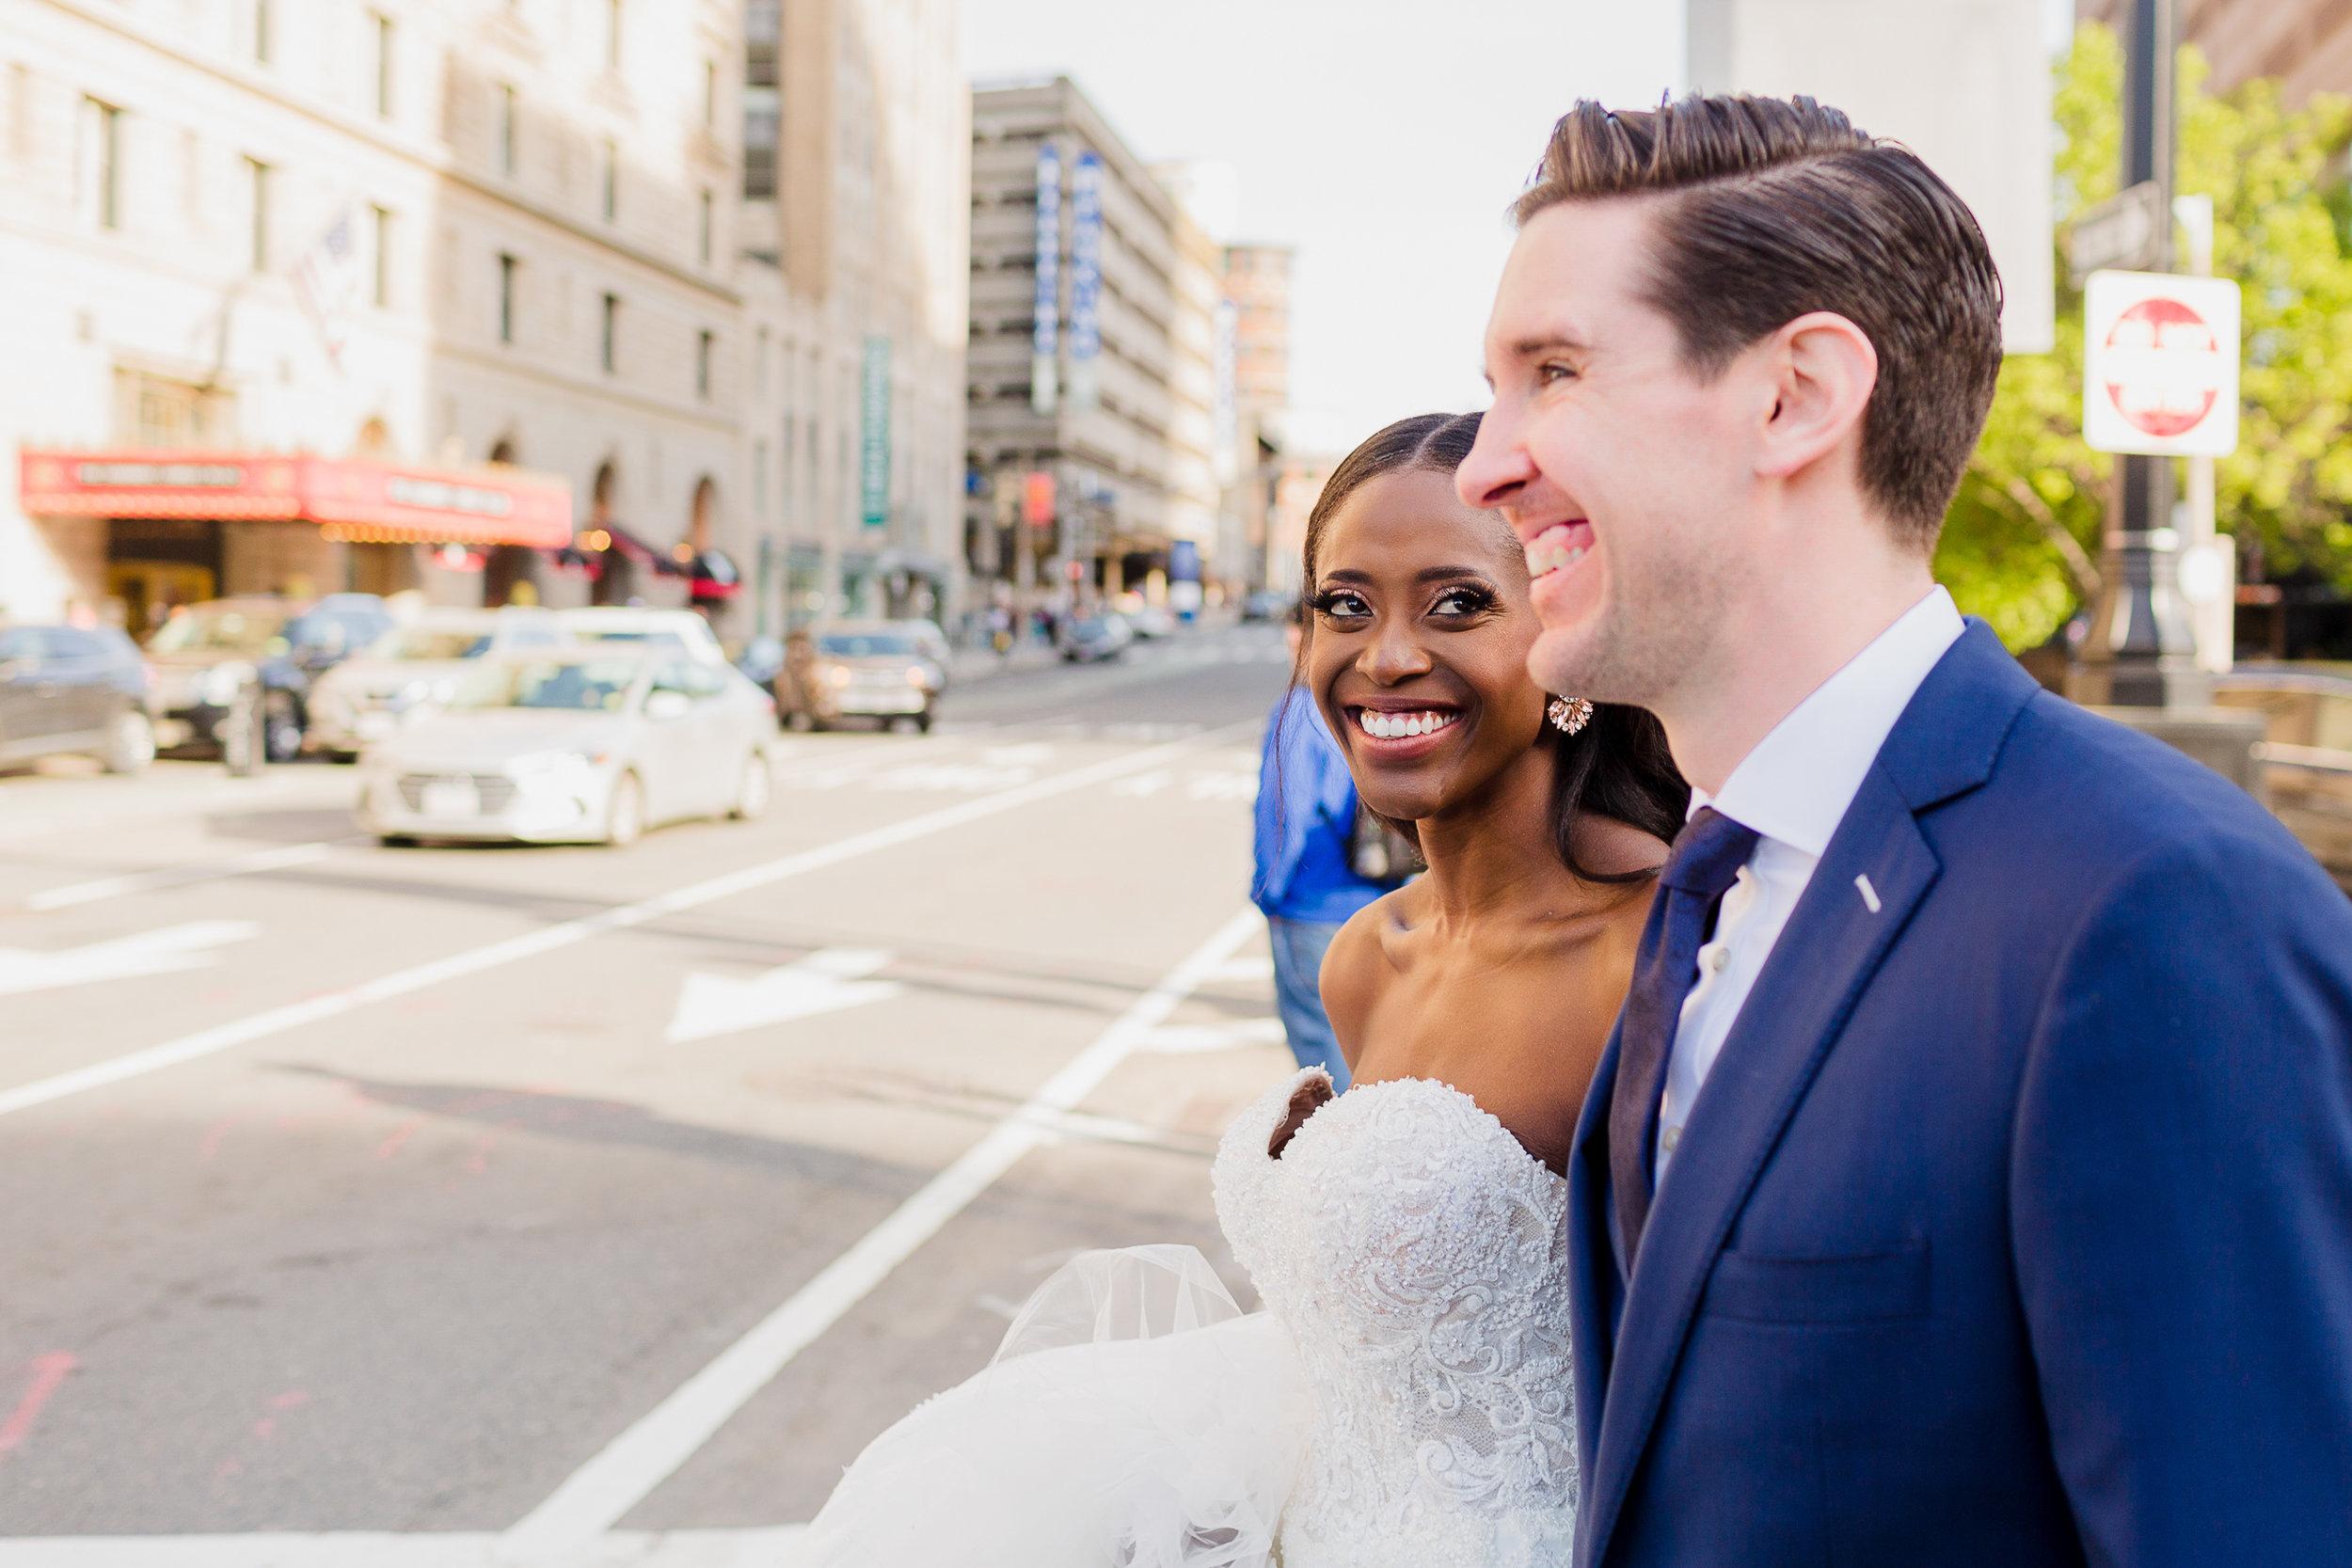 fairmont-copley-plaza-wedding-photos-00747.JPG